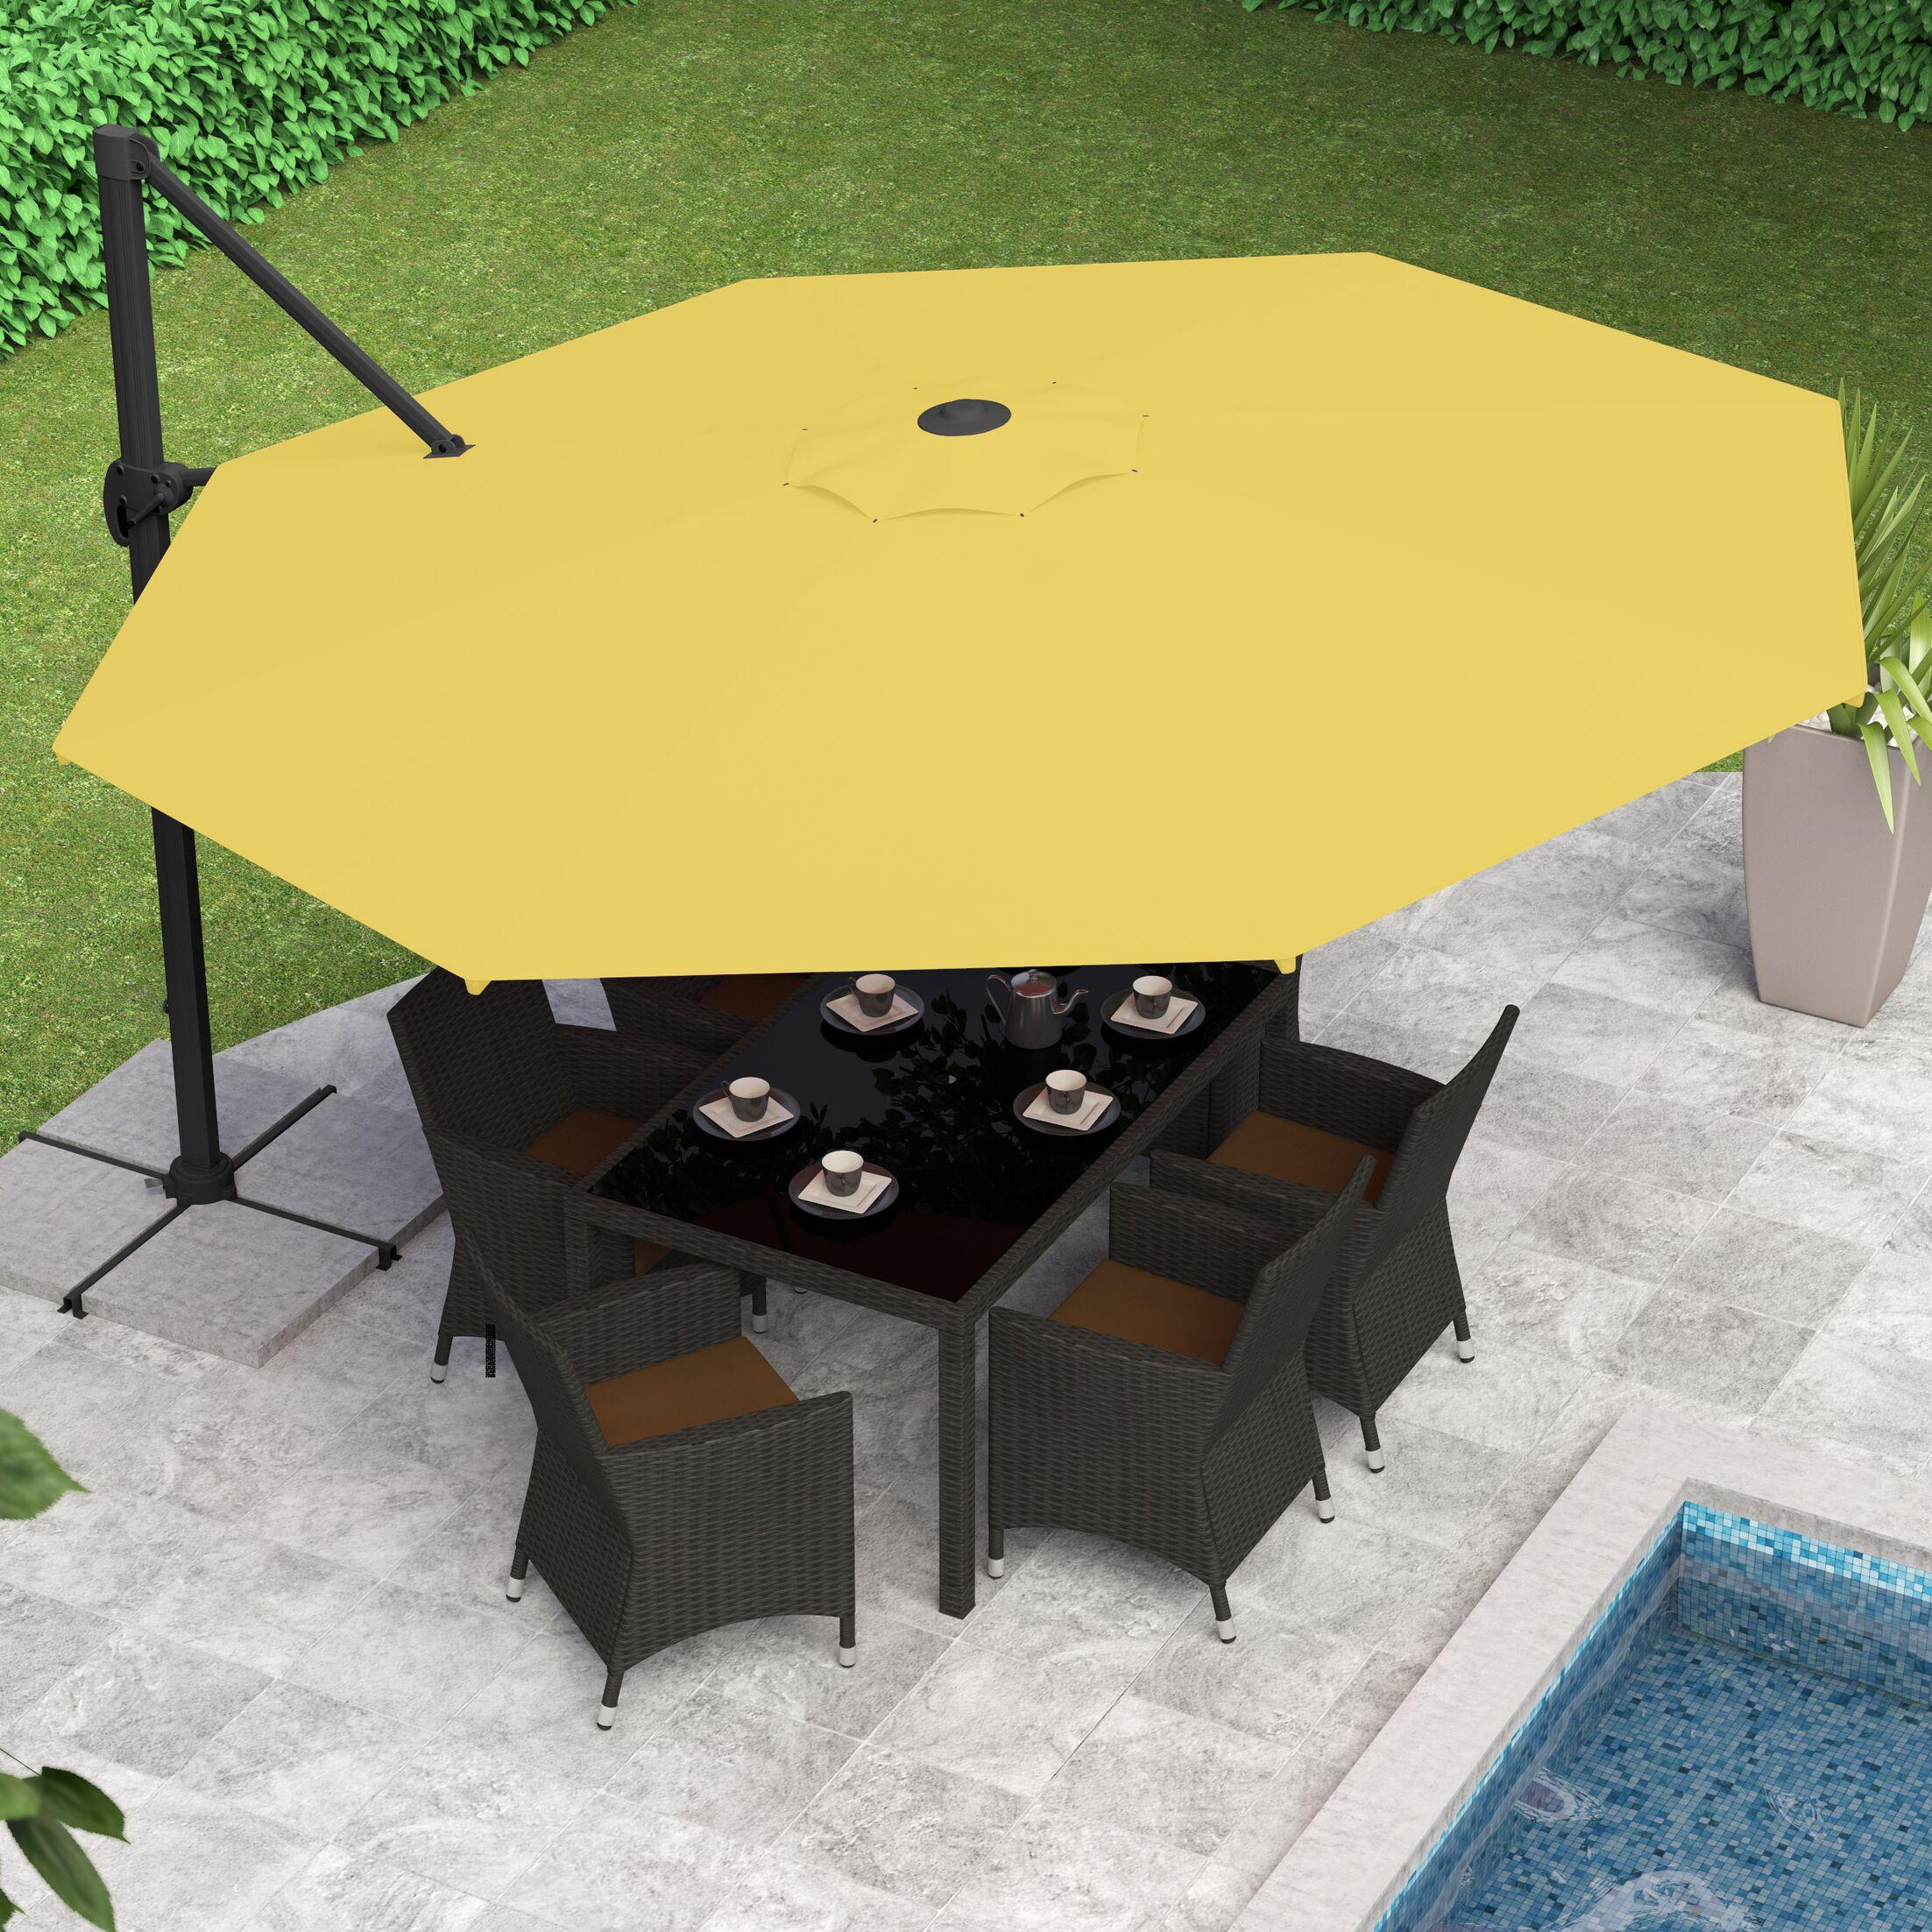 Gribble 11' Cantilever Umbrella Fabric Color: Yellow